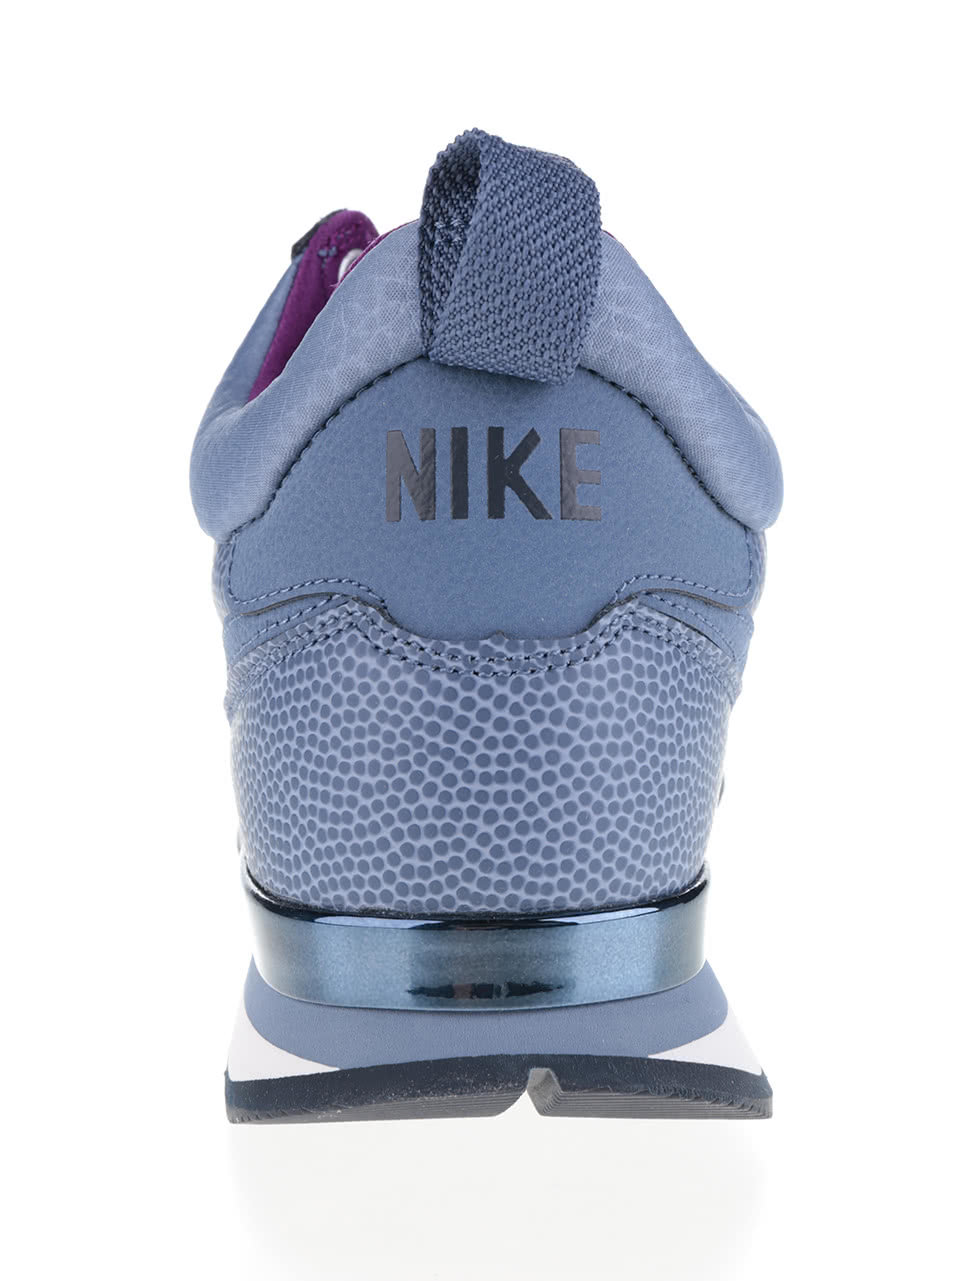 b91e7720fa40b Modré kožené dámske členkové tenisky Nike Internationalist Mid Leather ...